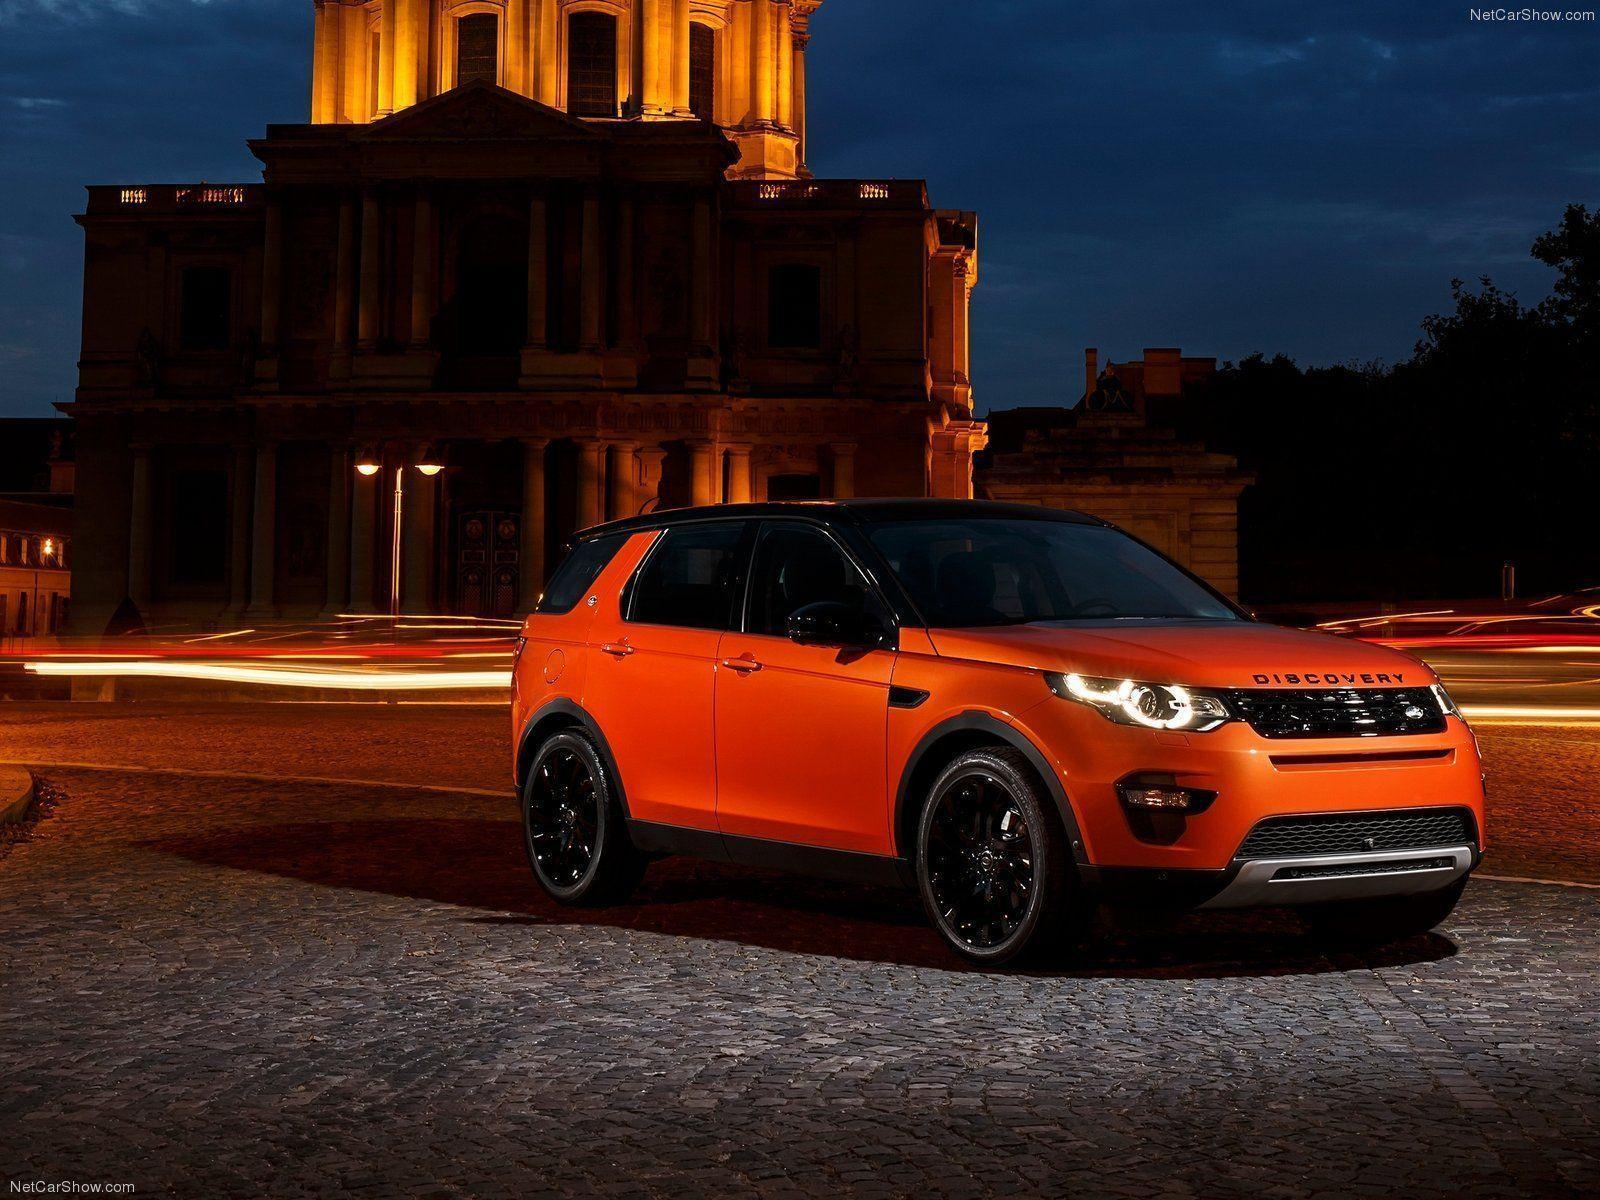 Wallpaper Land Rover Discovery Sport: Range Rover Sport 2015 Desktop Wallpapers 1600x1200